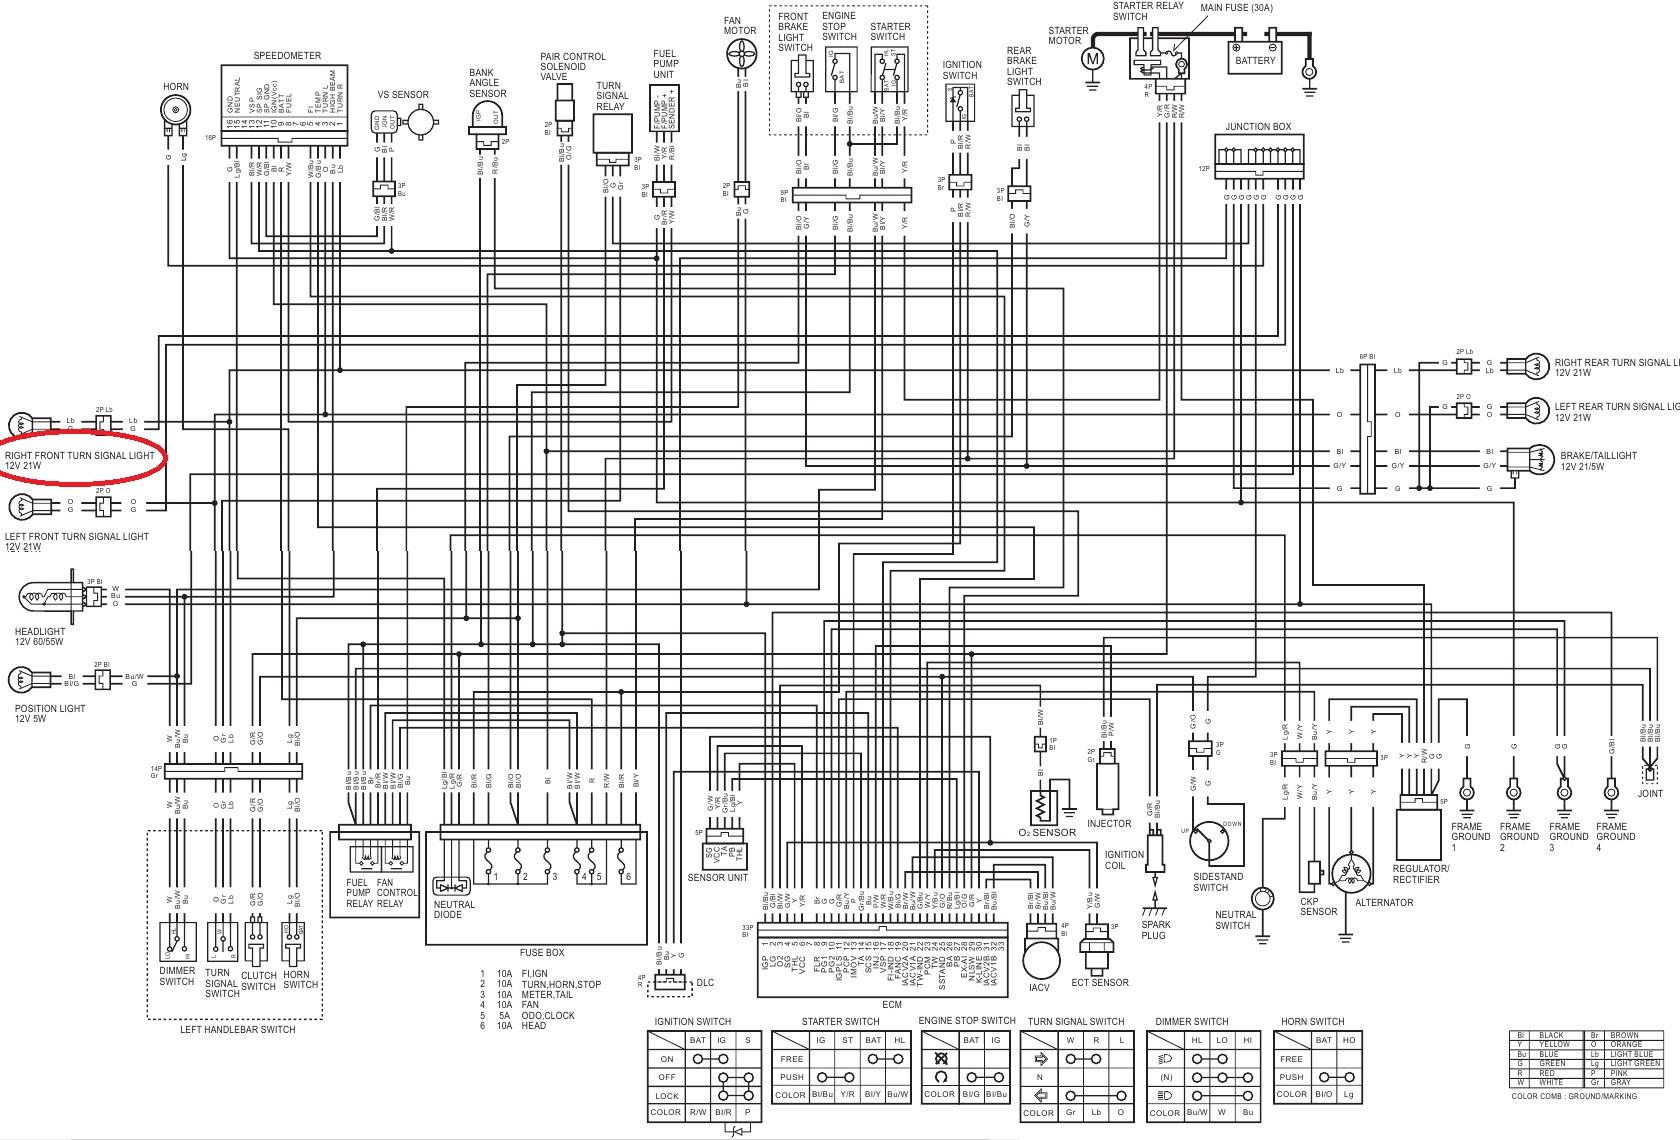 tags: #2015 dodge turn signal wiring harness#1953 international turn signal  wiring#1965 c10 turn signal switch#kenworth turn signal ground#street rod  turn